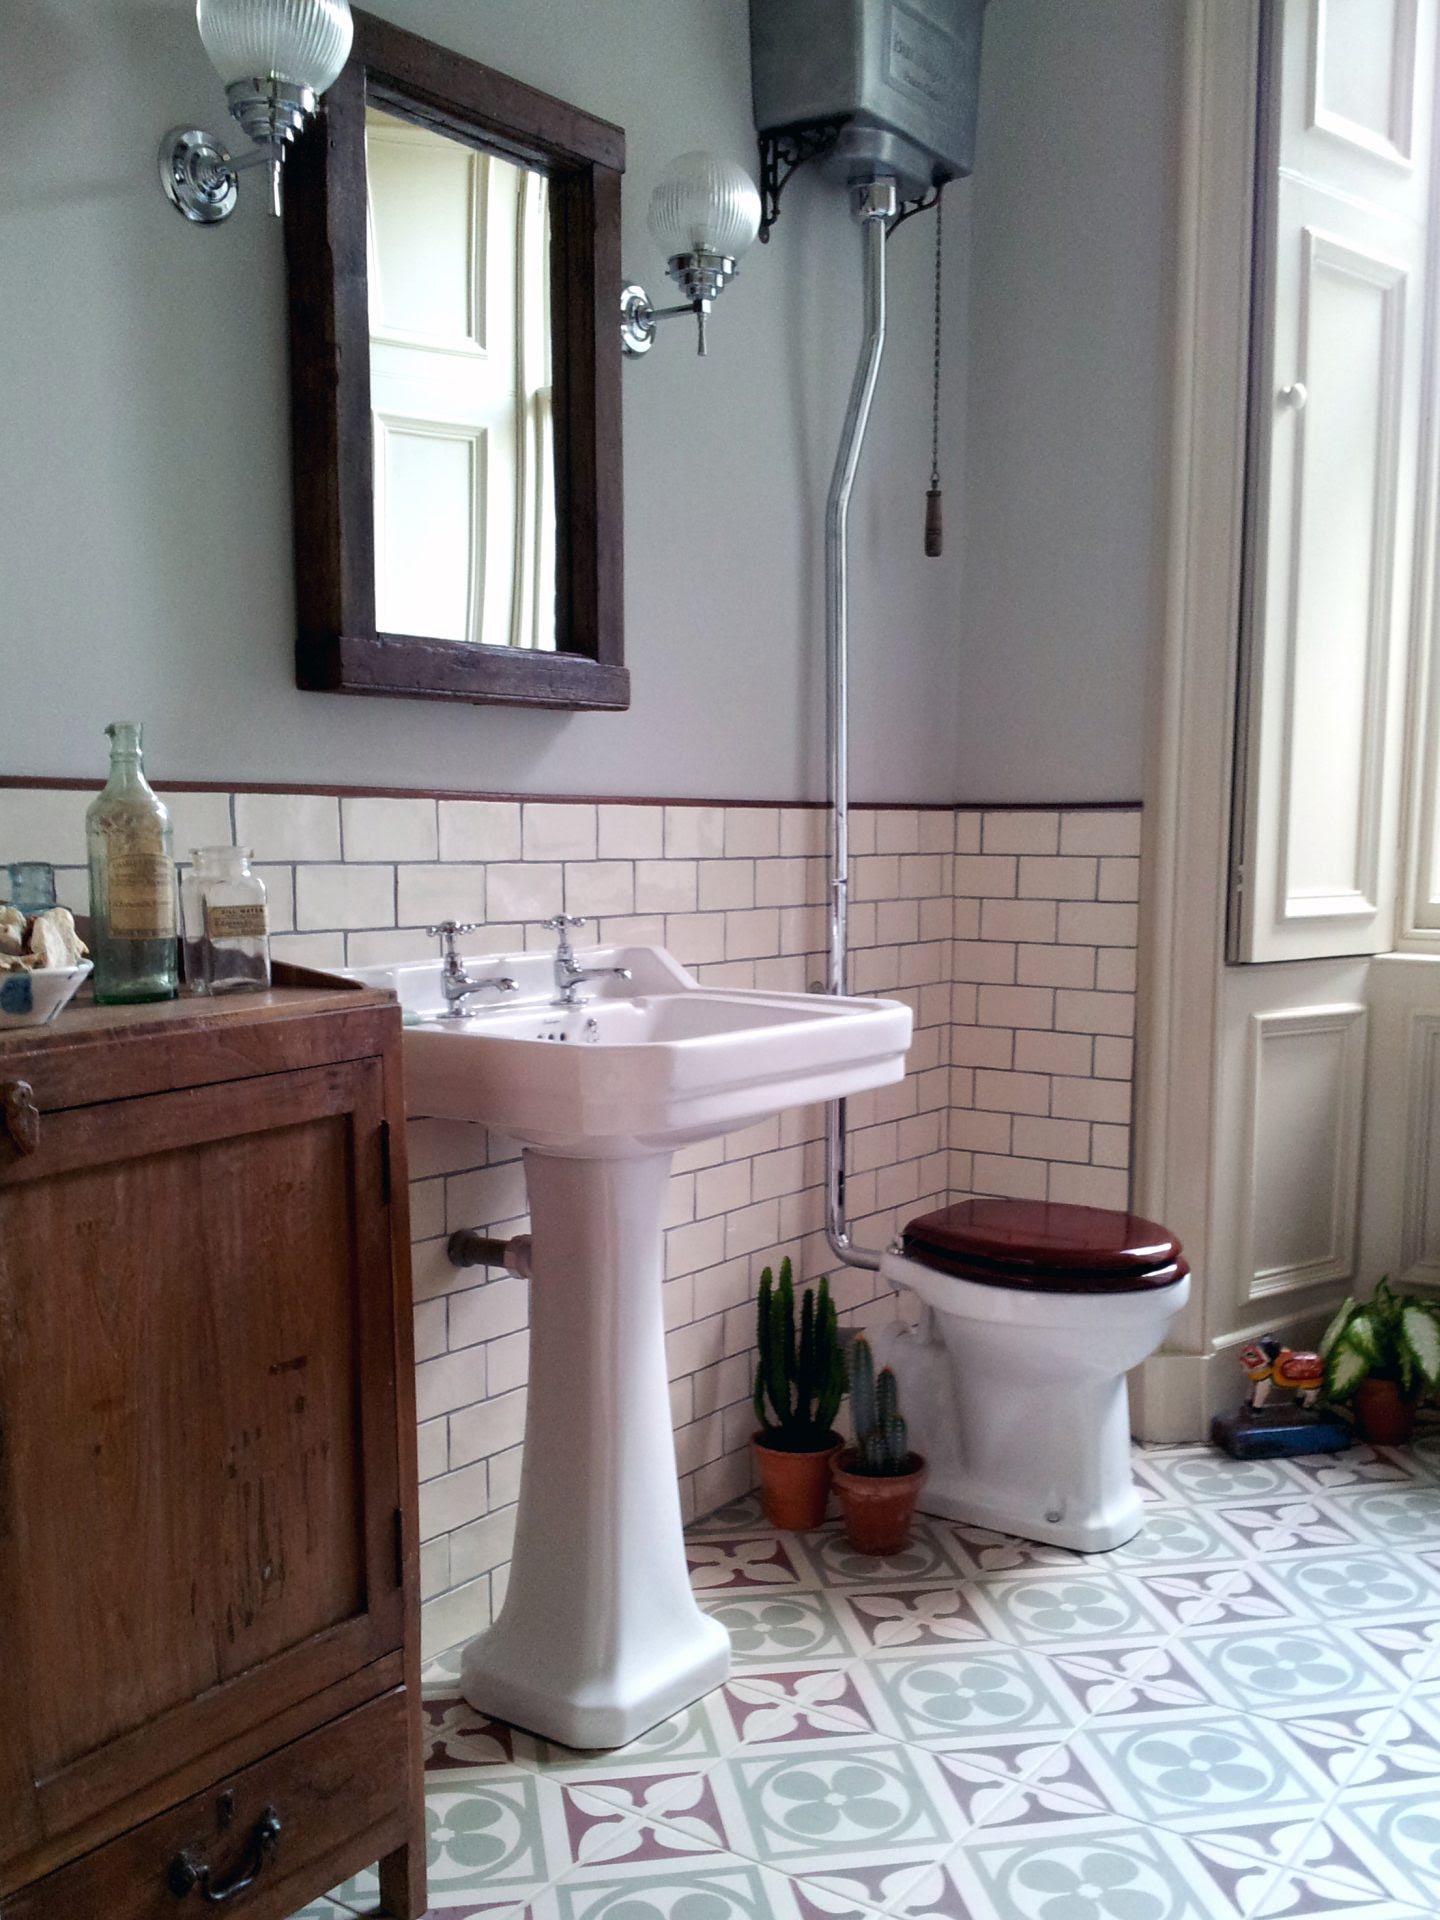 Vintage Bathrooms: Scaramanga's Redesign Do's & Don'ts ...